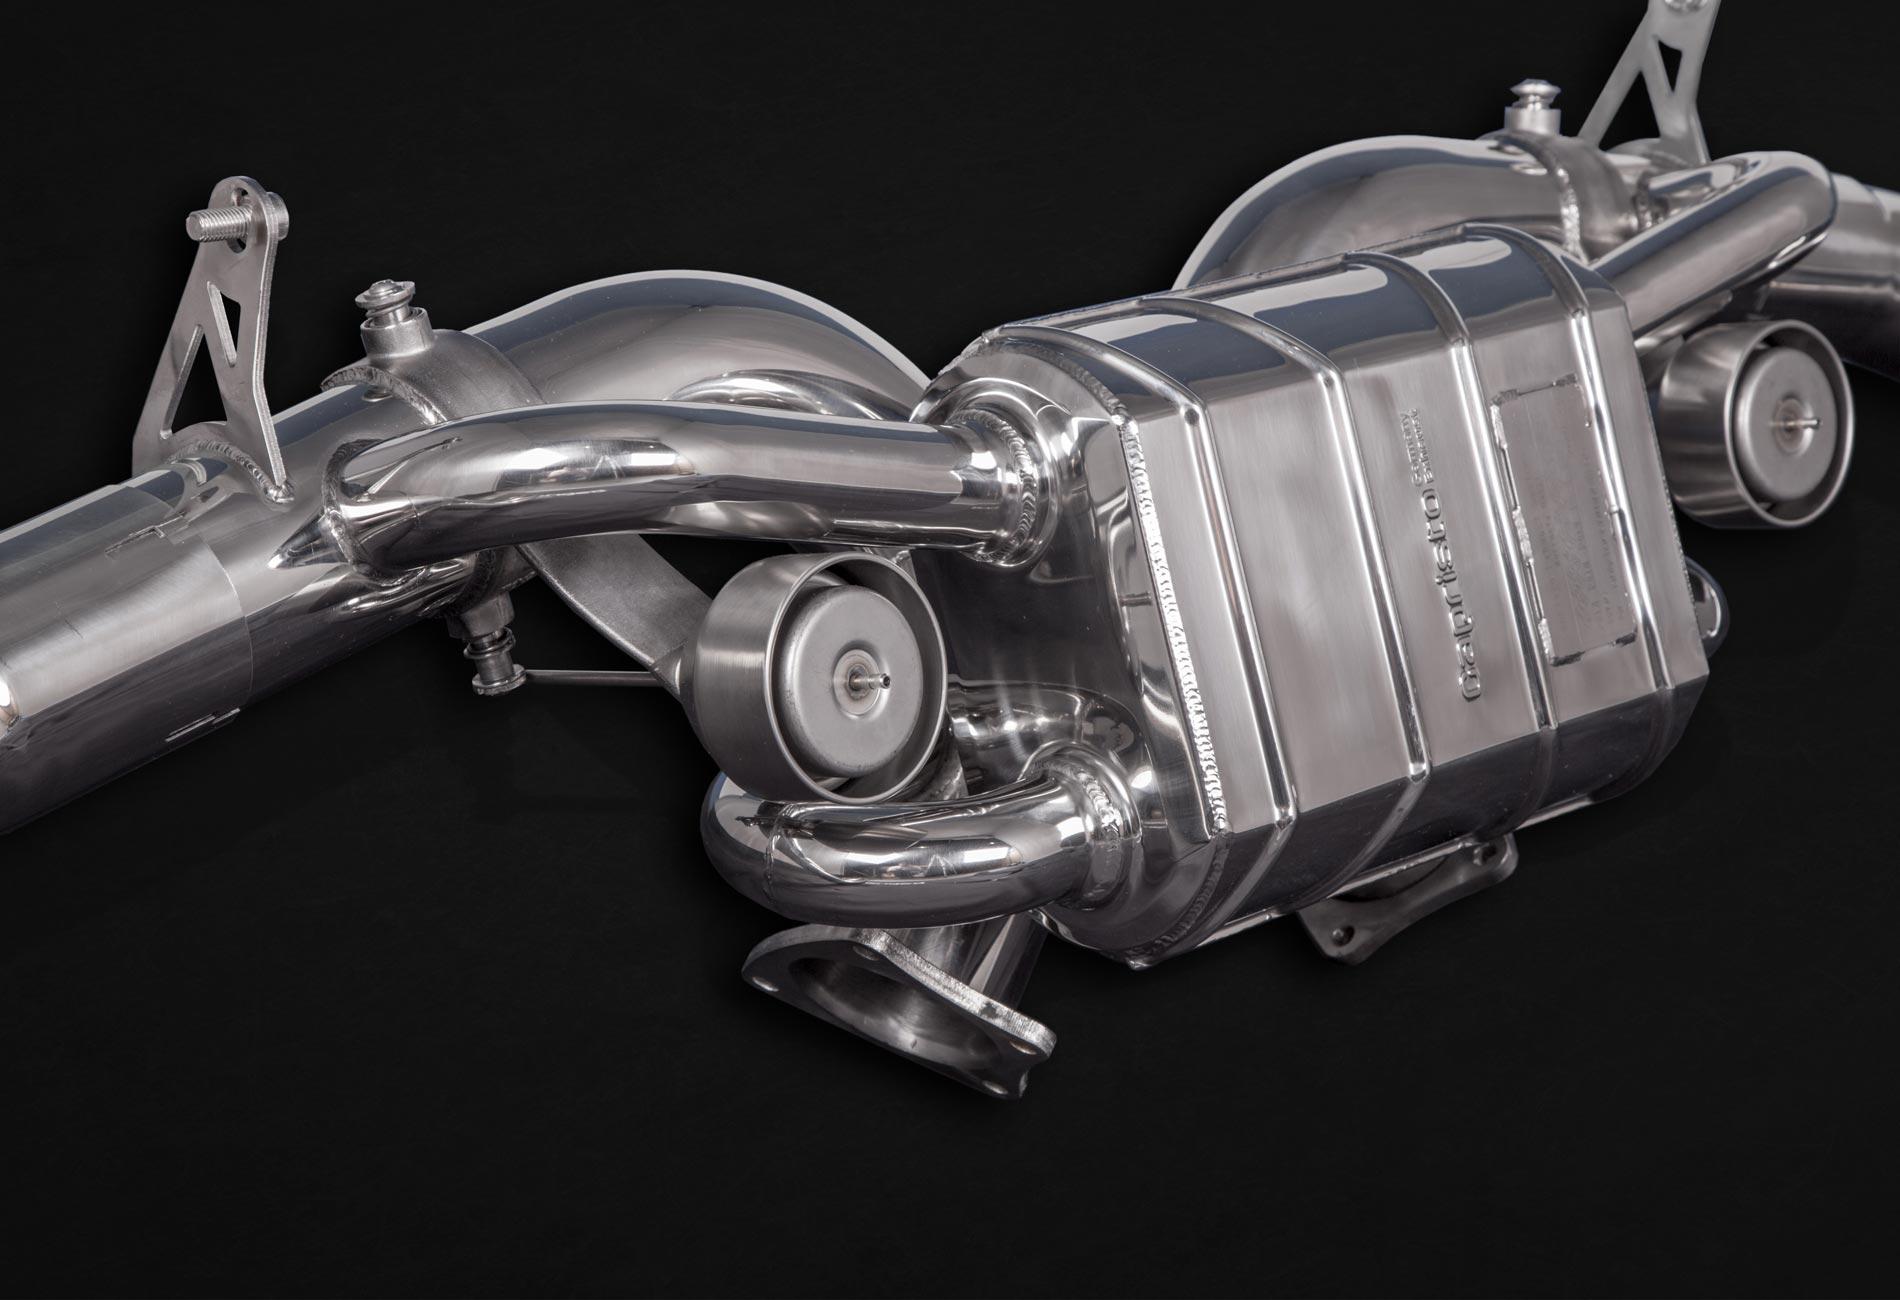 Audi-R8-Spyder-by-Wheelsandmore-8